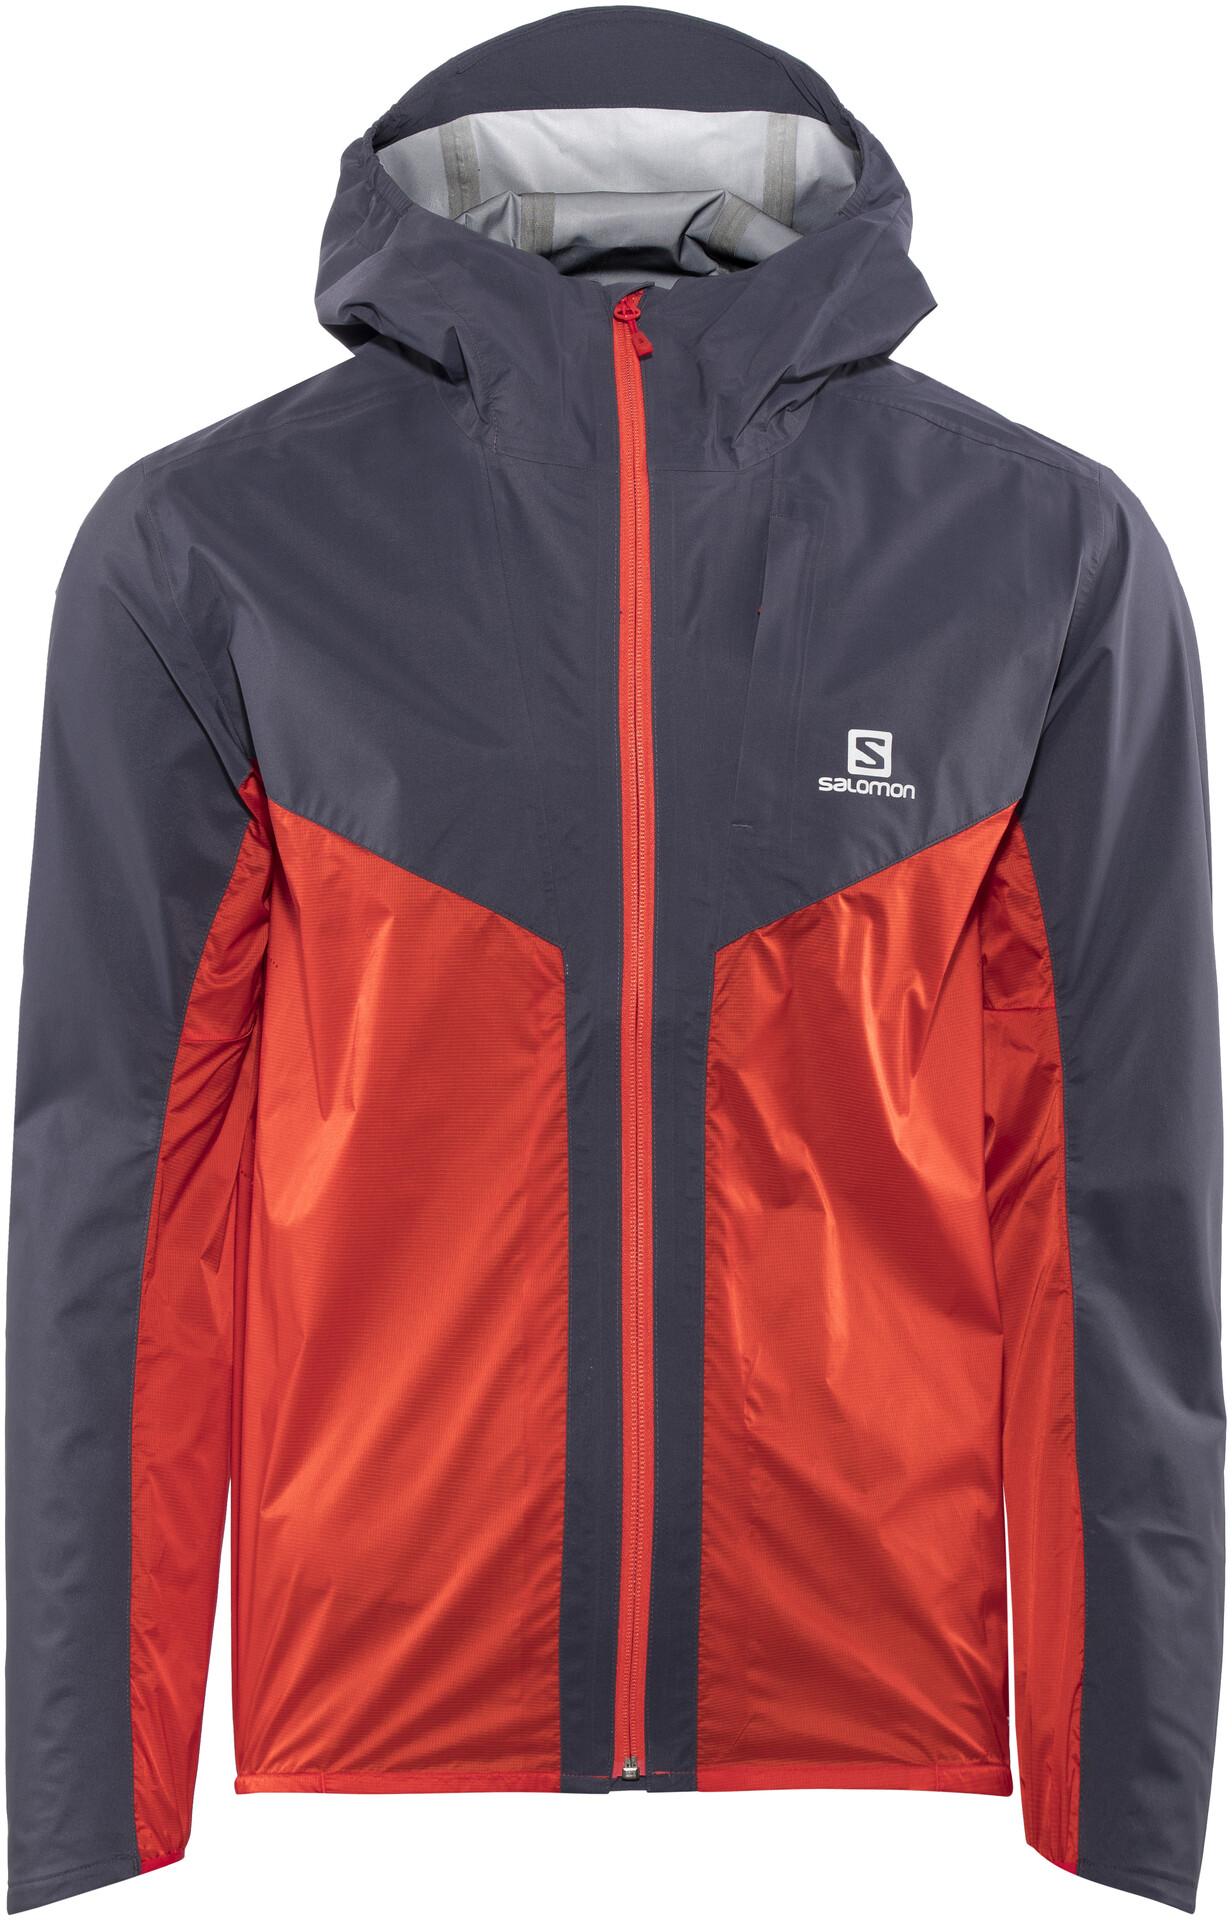 Salomon Outspeed Hybrid Jacket Jkt M (Graphite fiery red